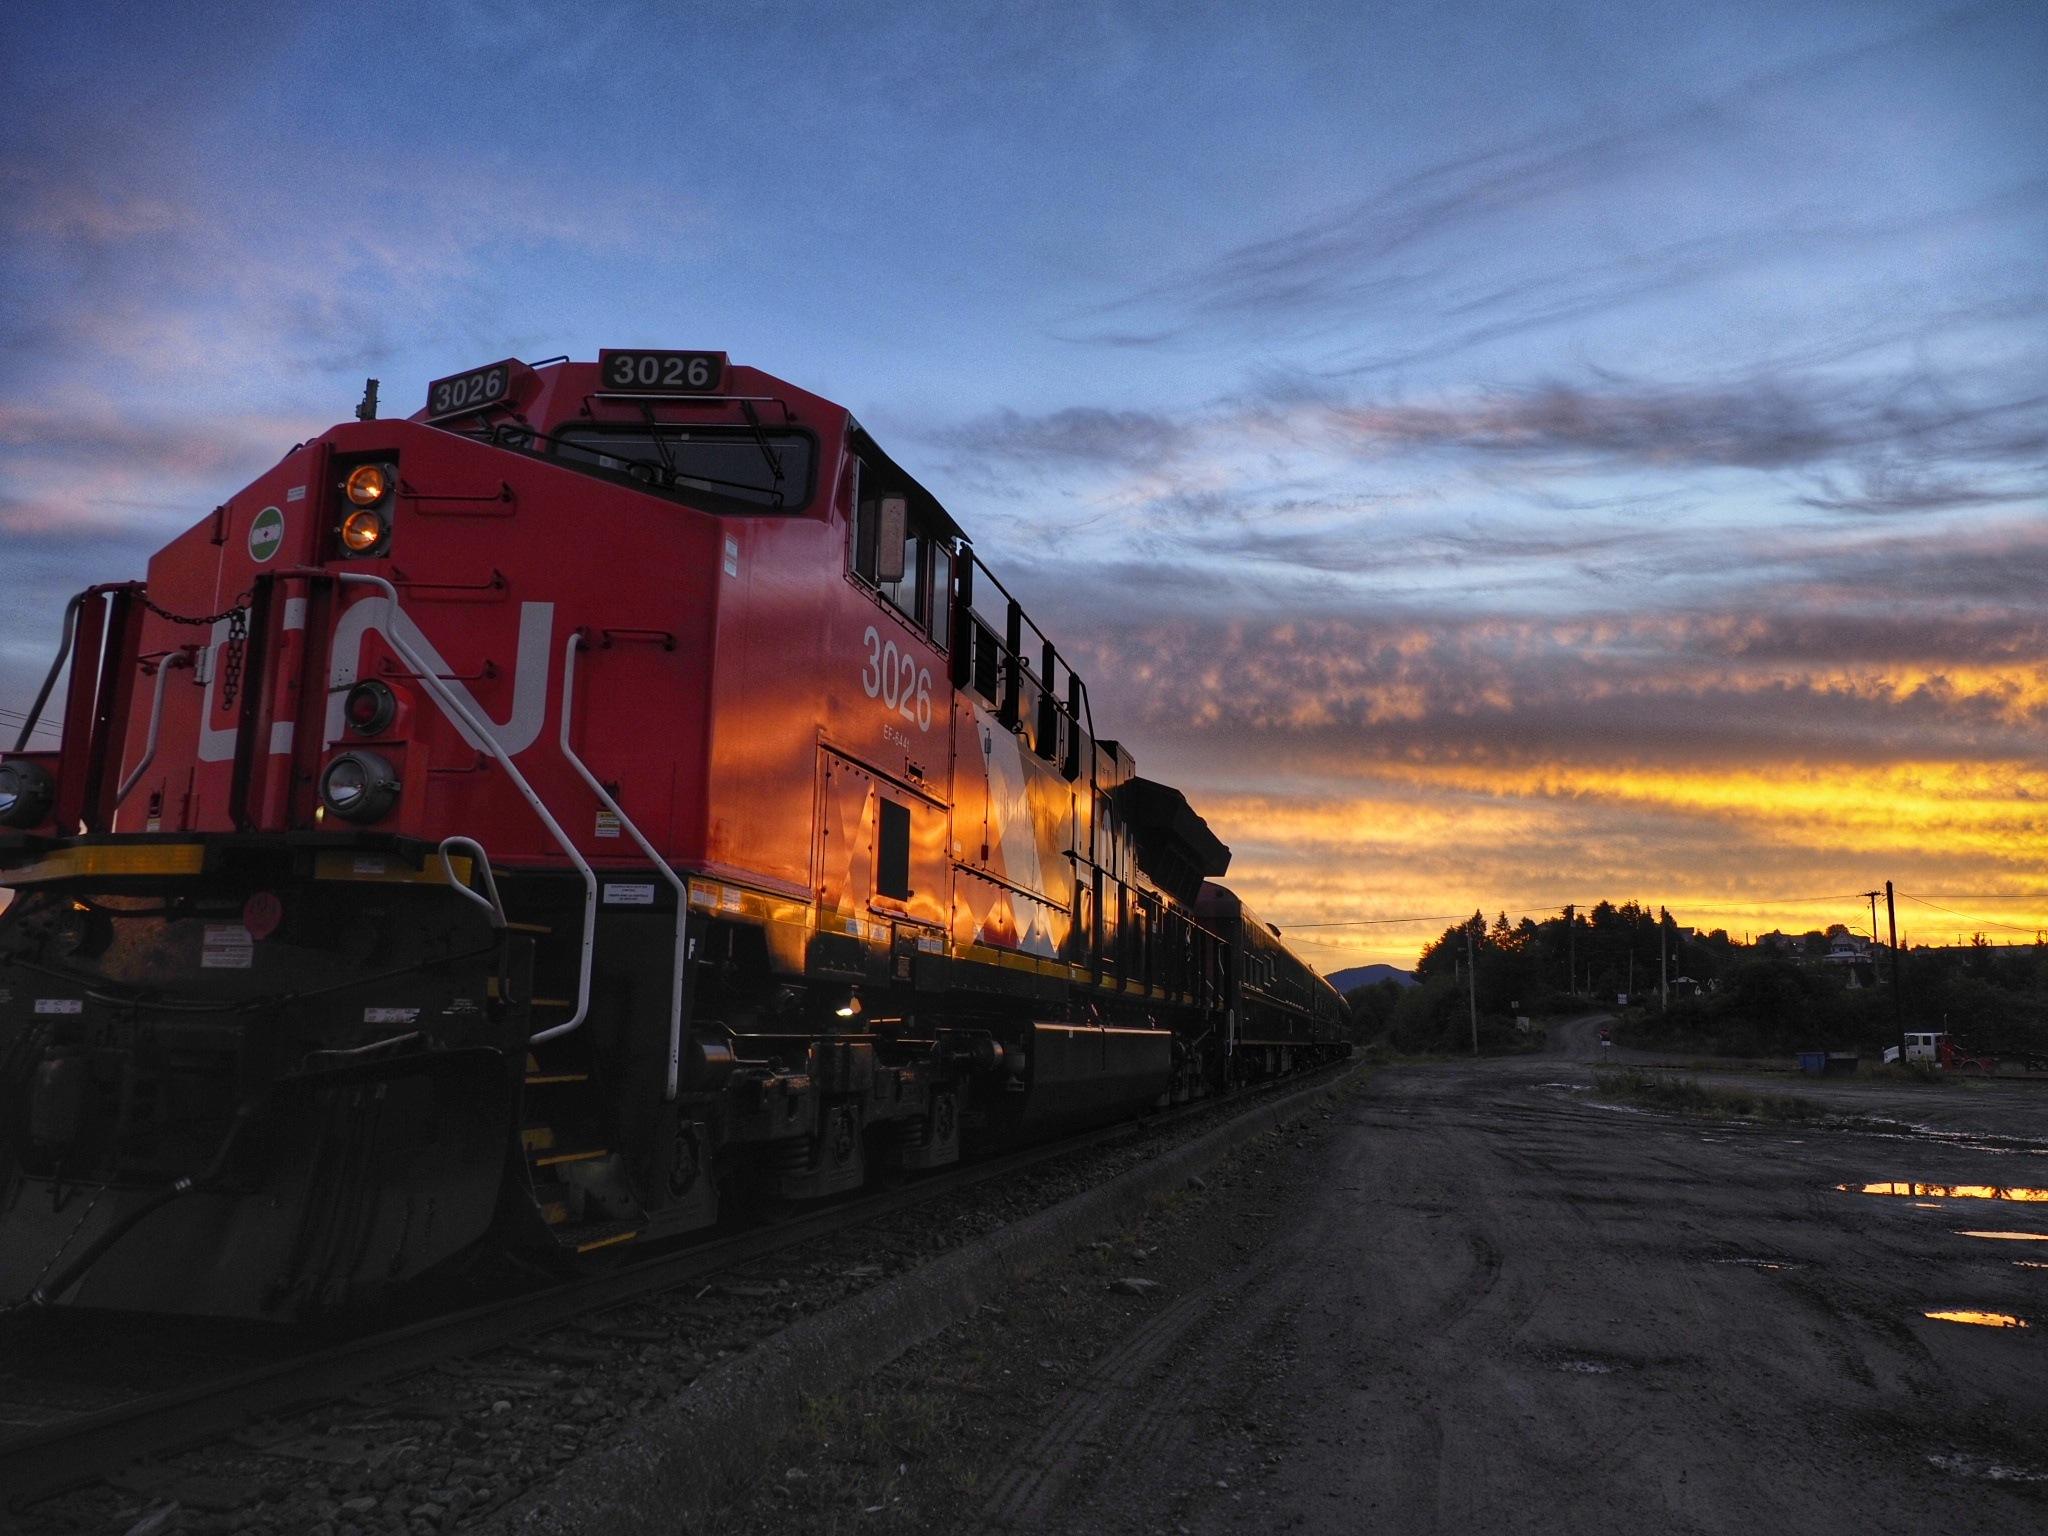 locomotive sunrise by Evan Spellman